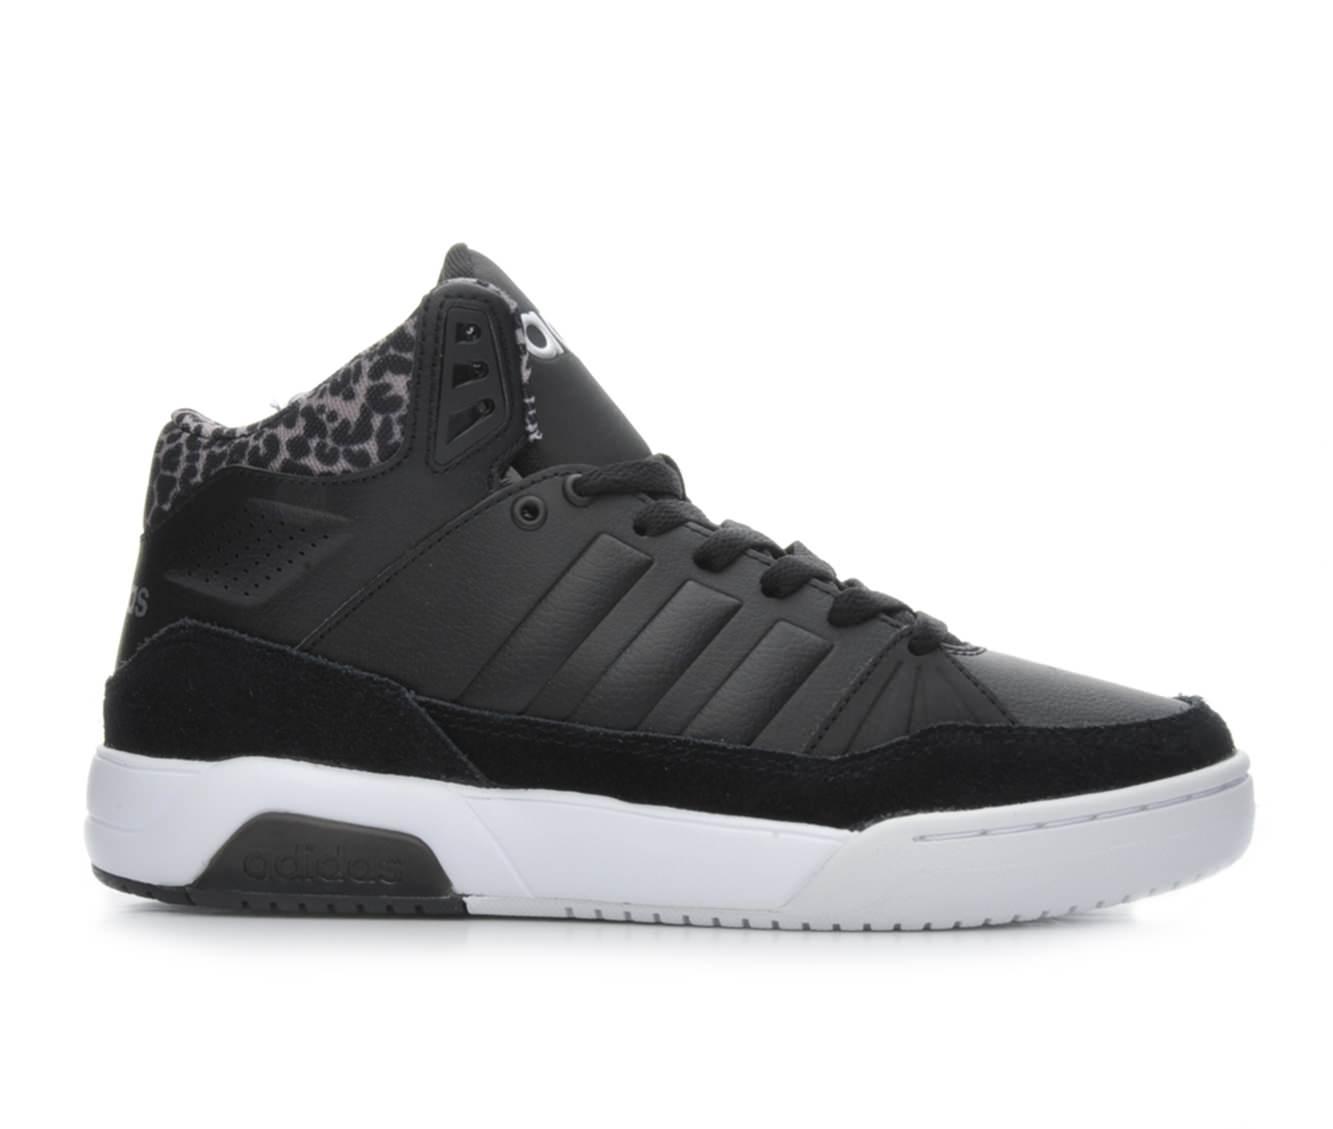 Adidas Play9 TIS